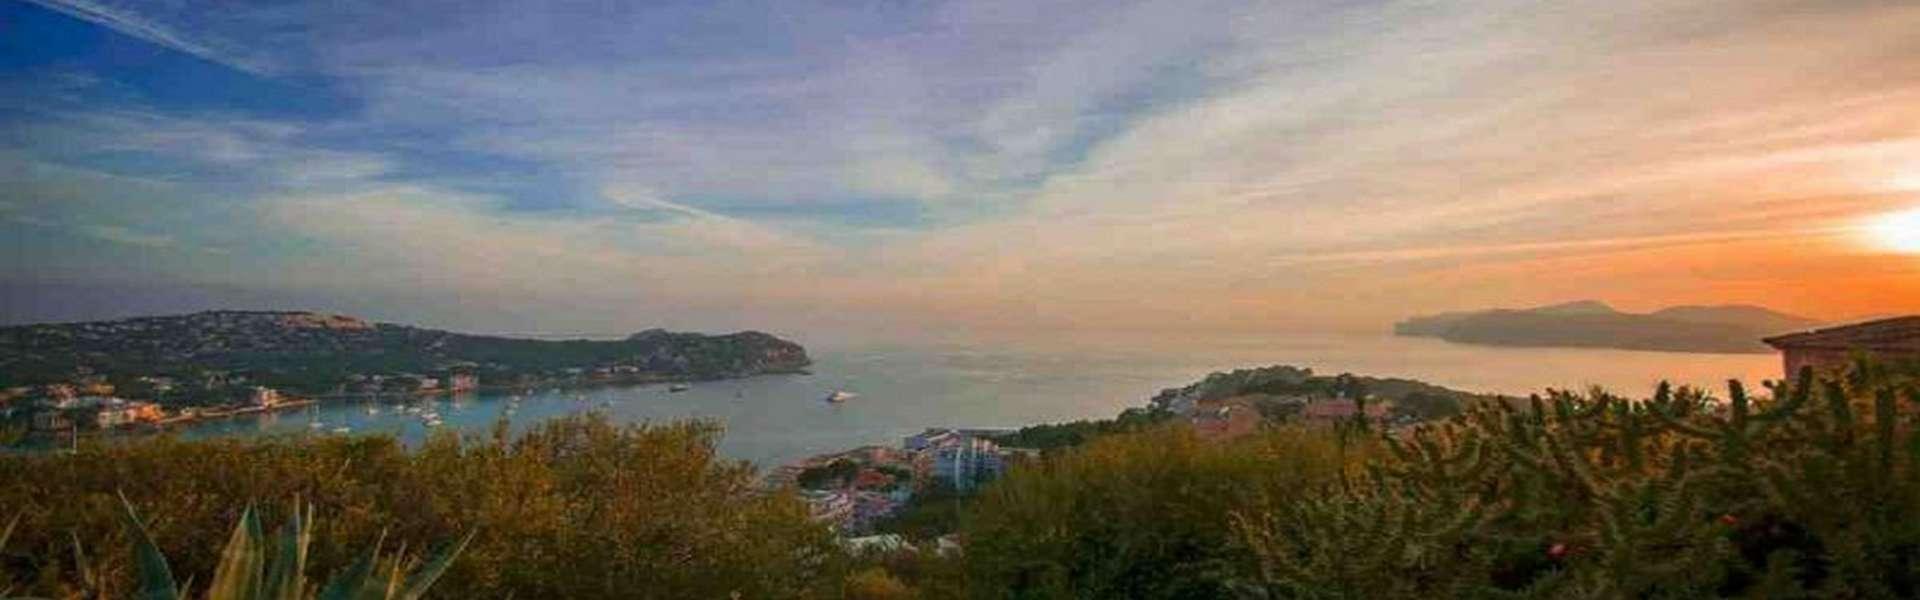 Santa Ponsa - Meerblickgrundstück in Toplage